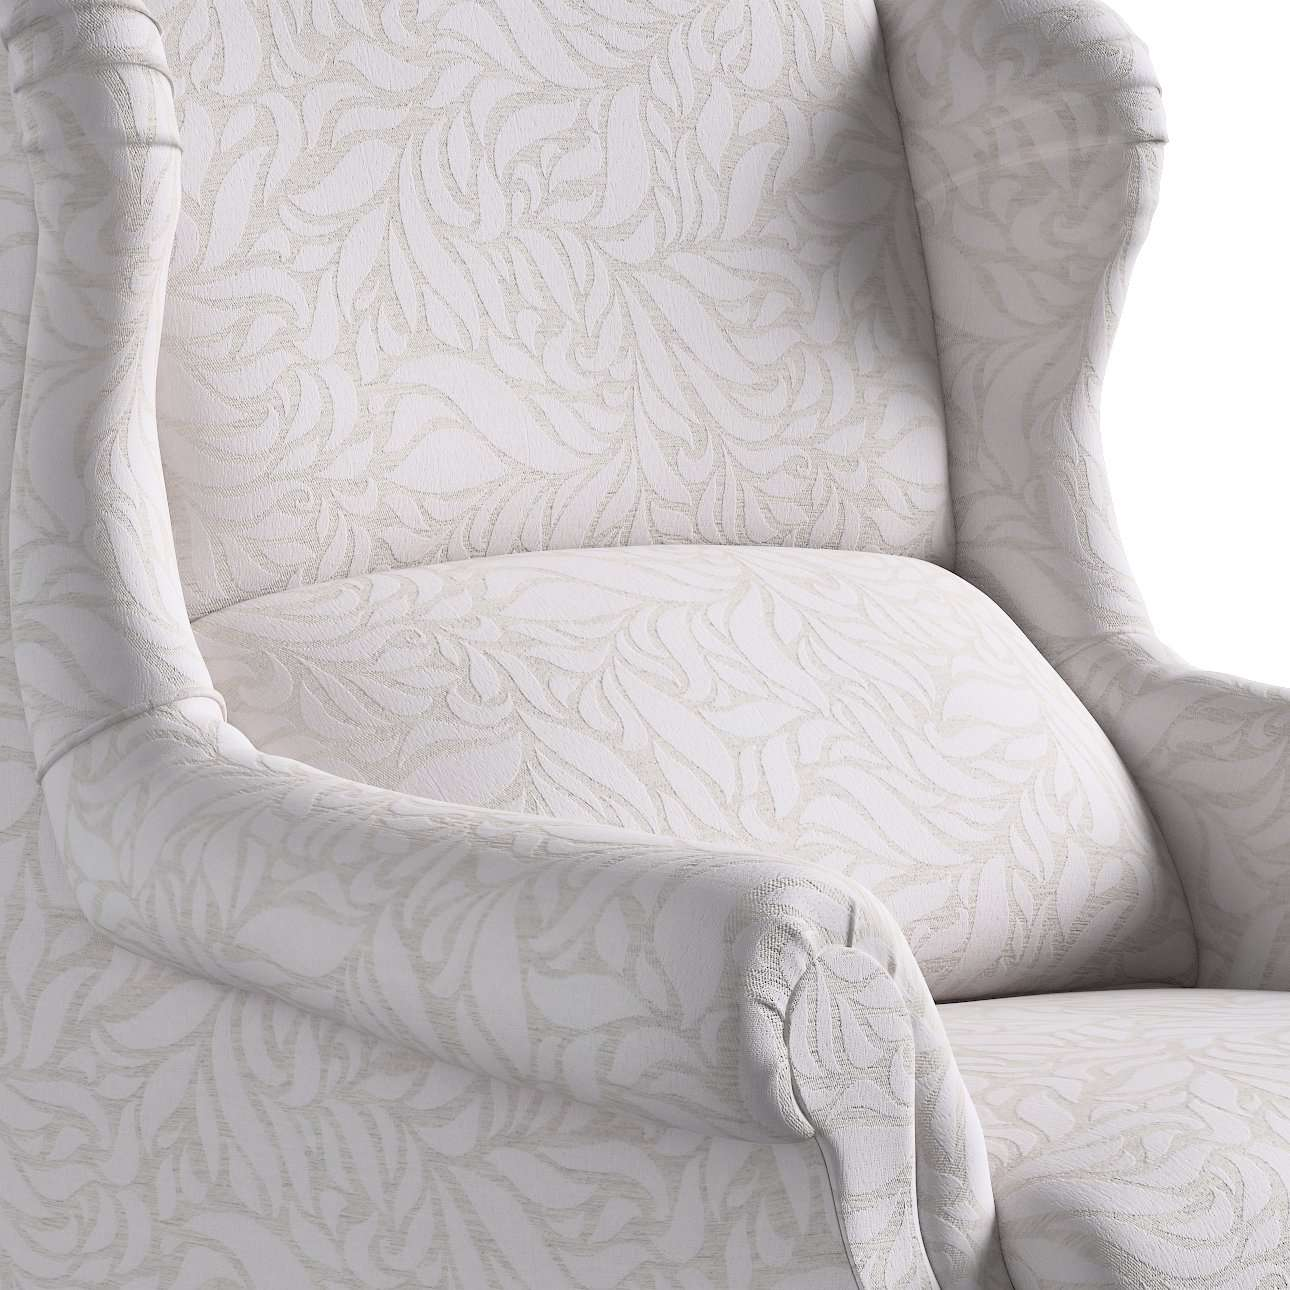 Stilingas Dekoria fotelis 63 x 115 cm kolekcijoje Venice, audinys: 140-50